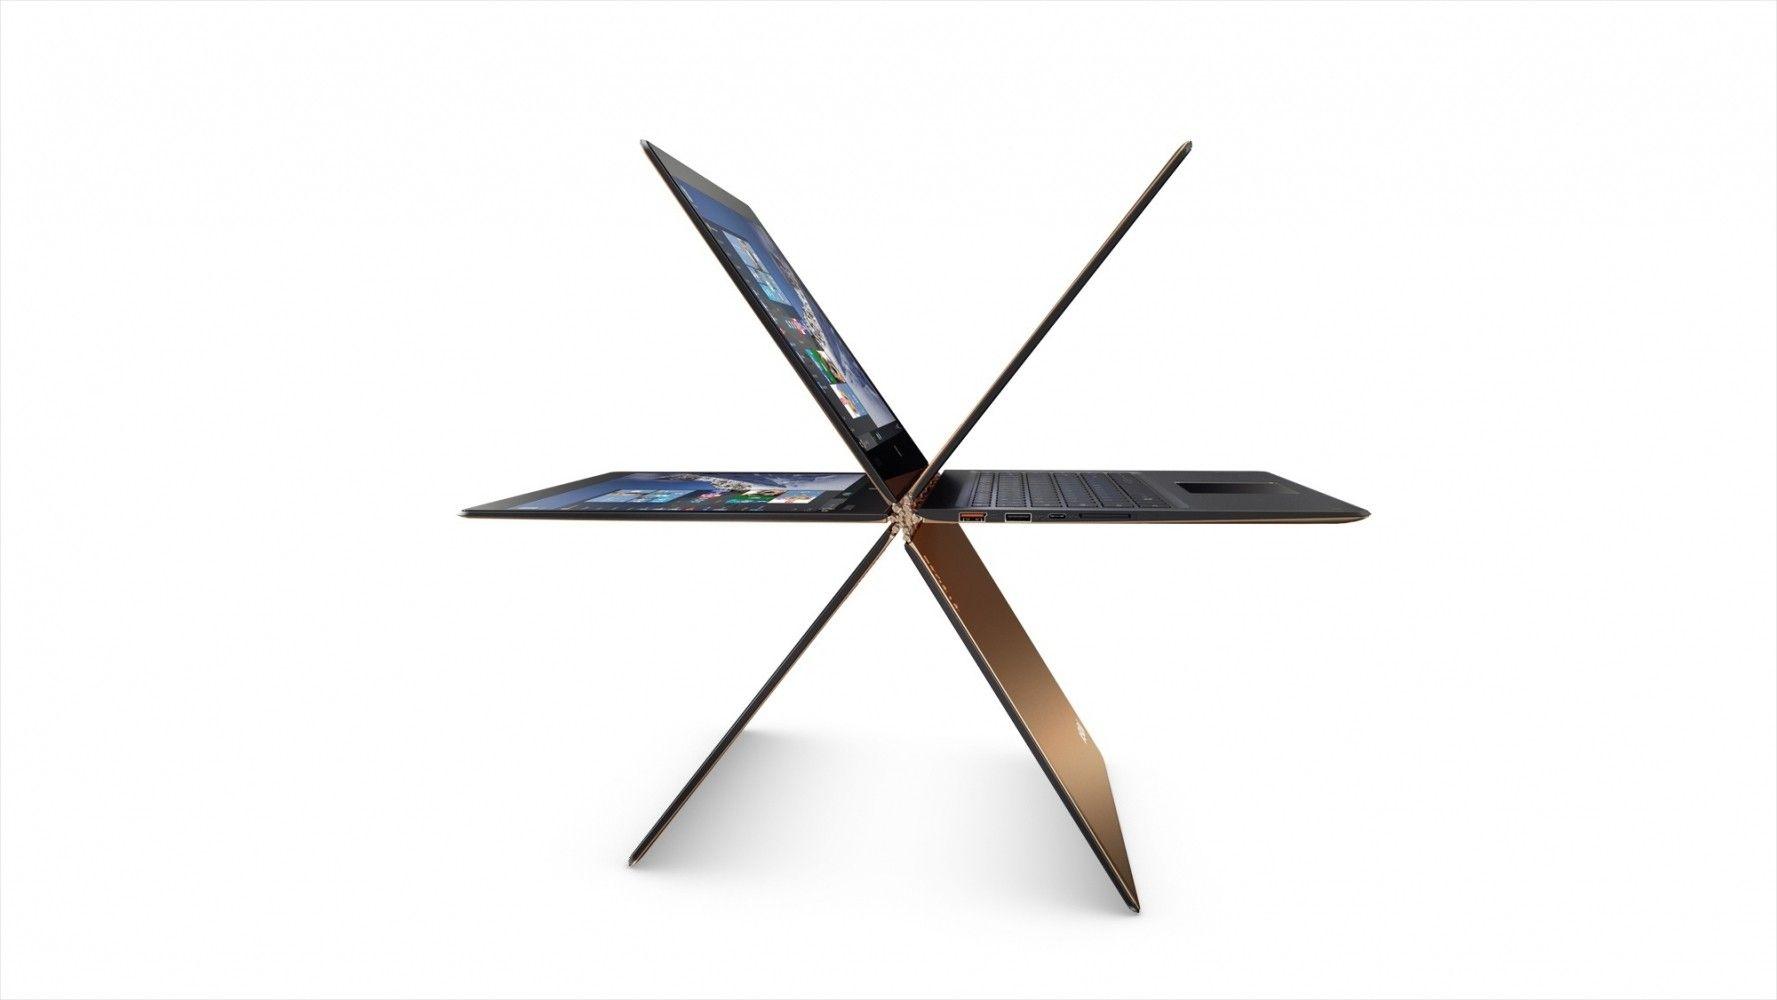 Ноутбук Lenovo Yoga 900-13 (80MK00MBUA) Gold - 1